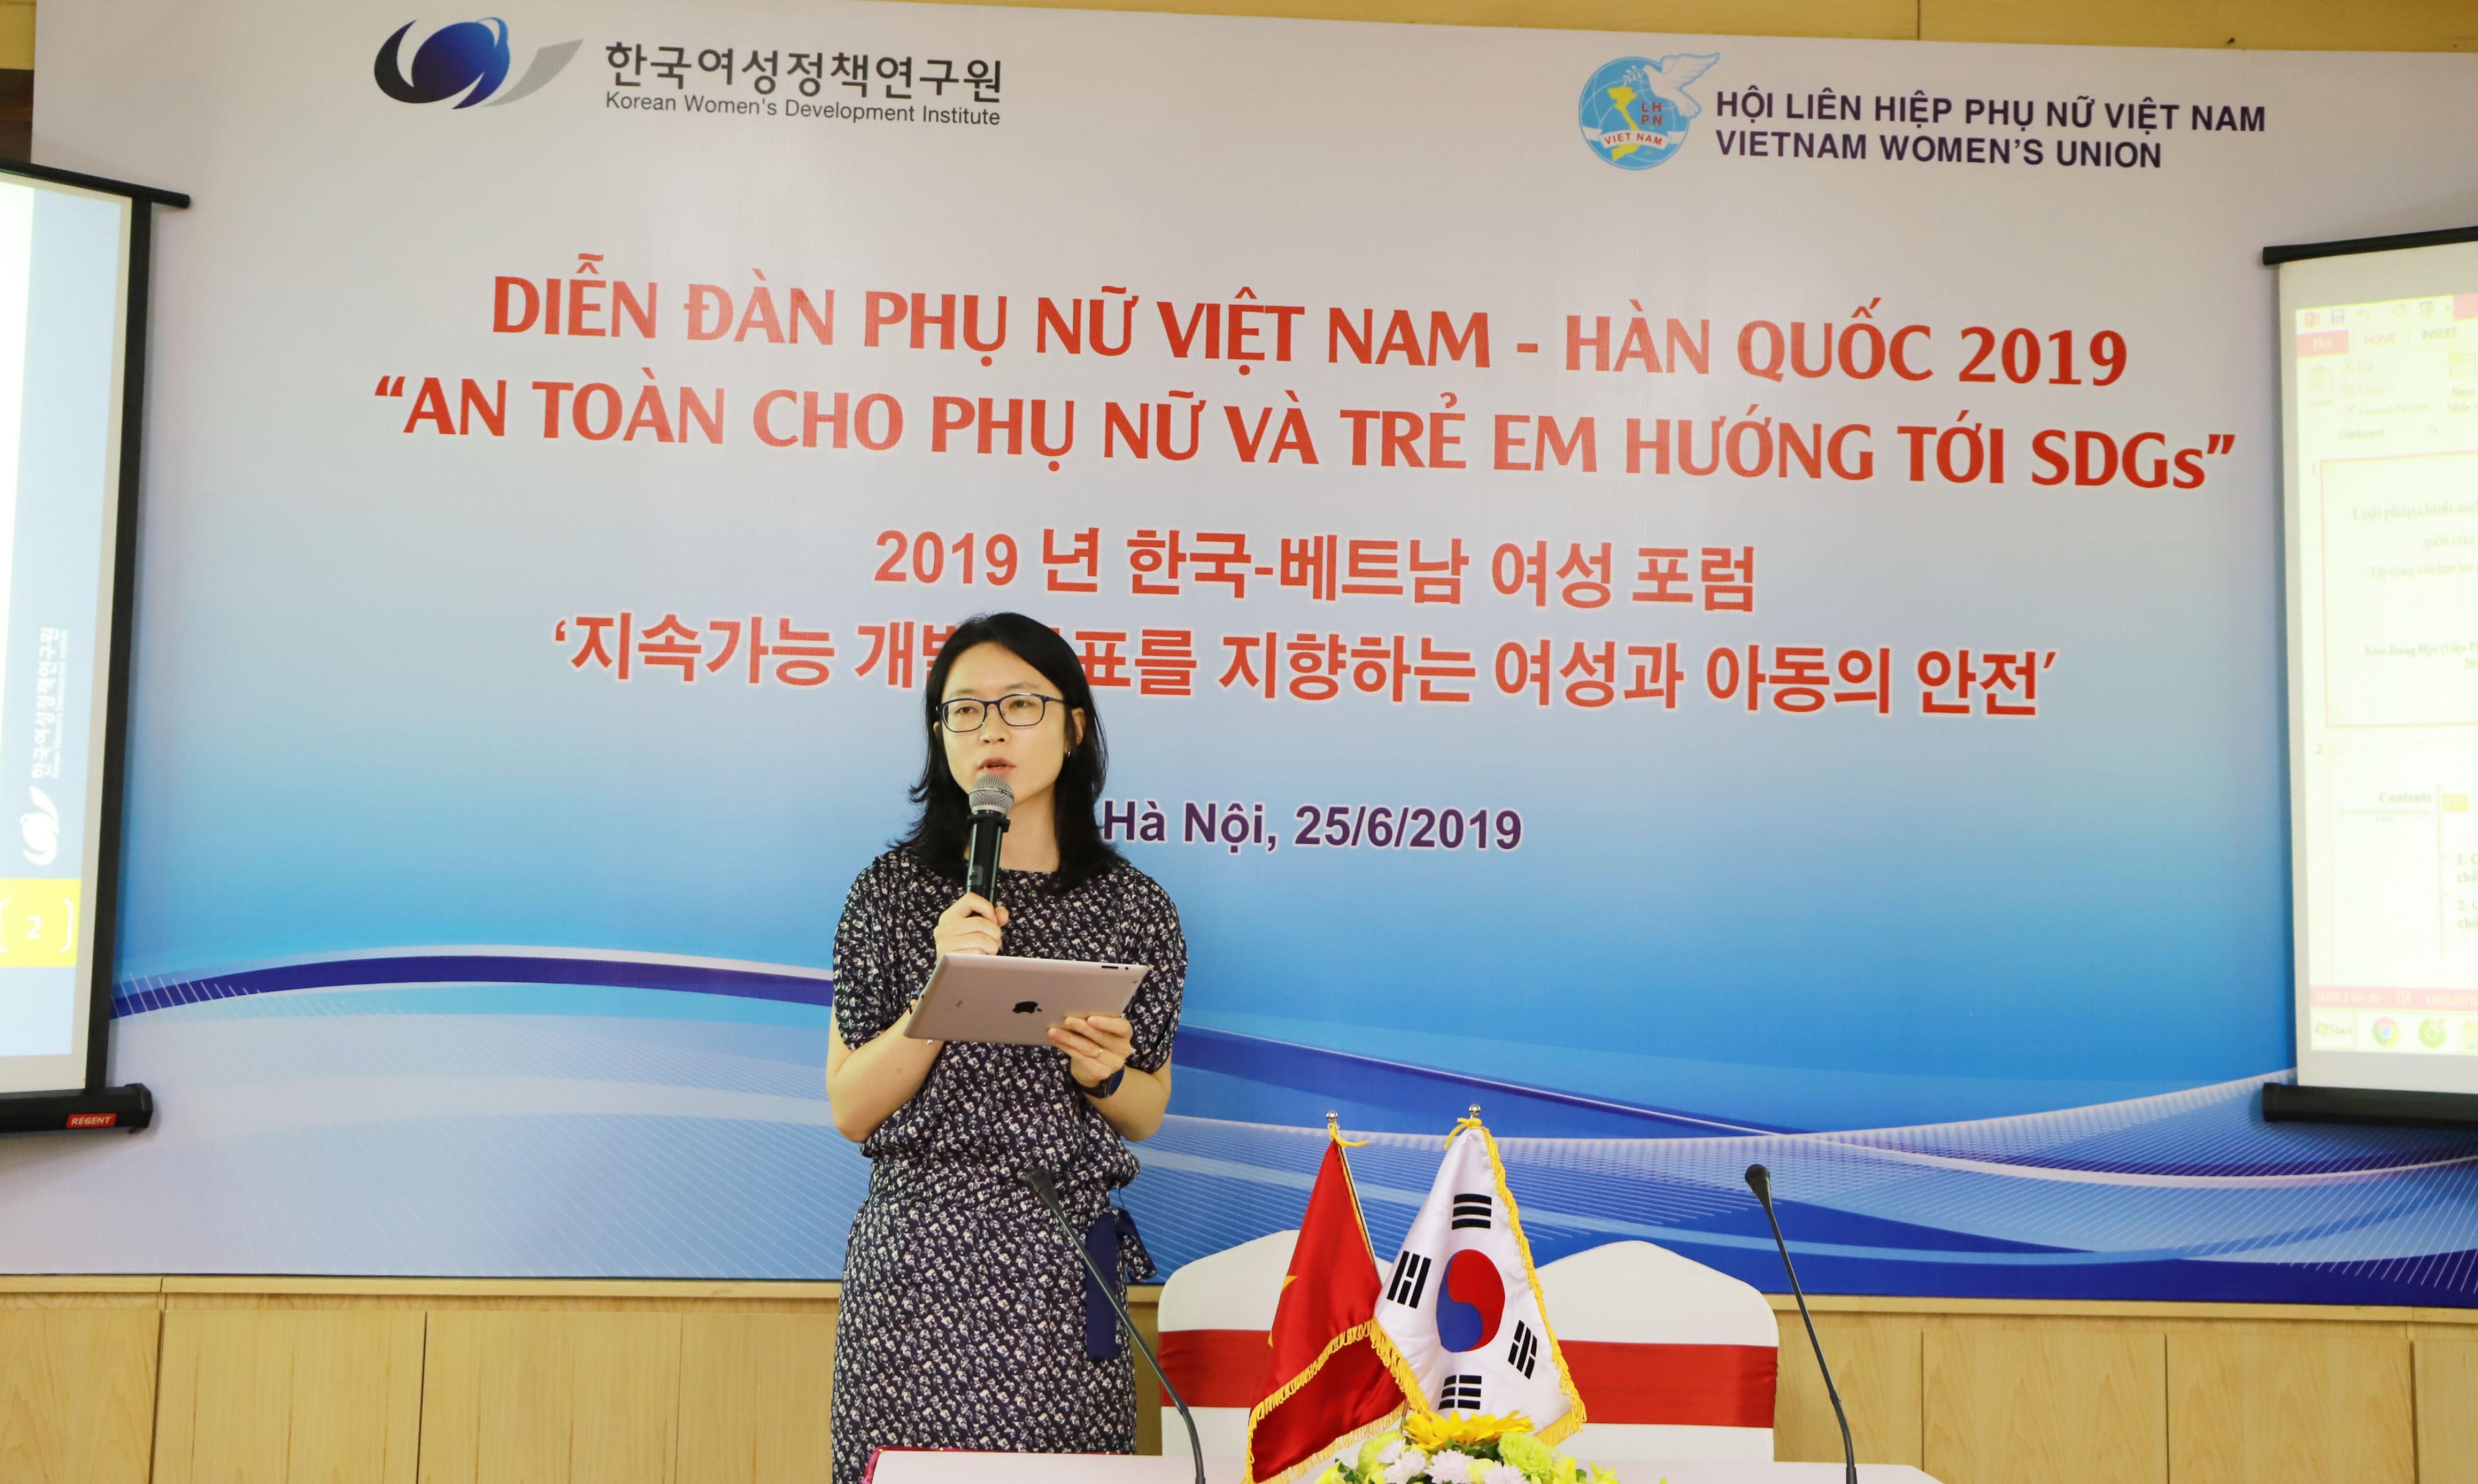 jeong-hye-kim-dien-dan-phu-nu-viet-han-4.JPG